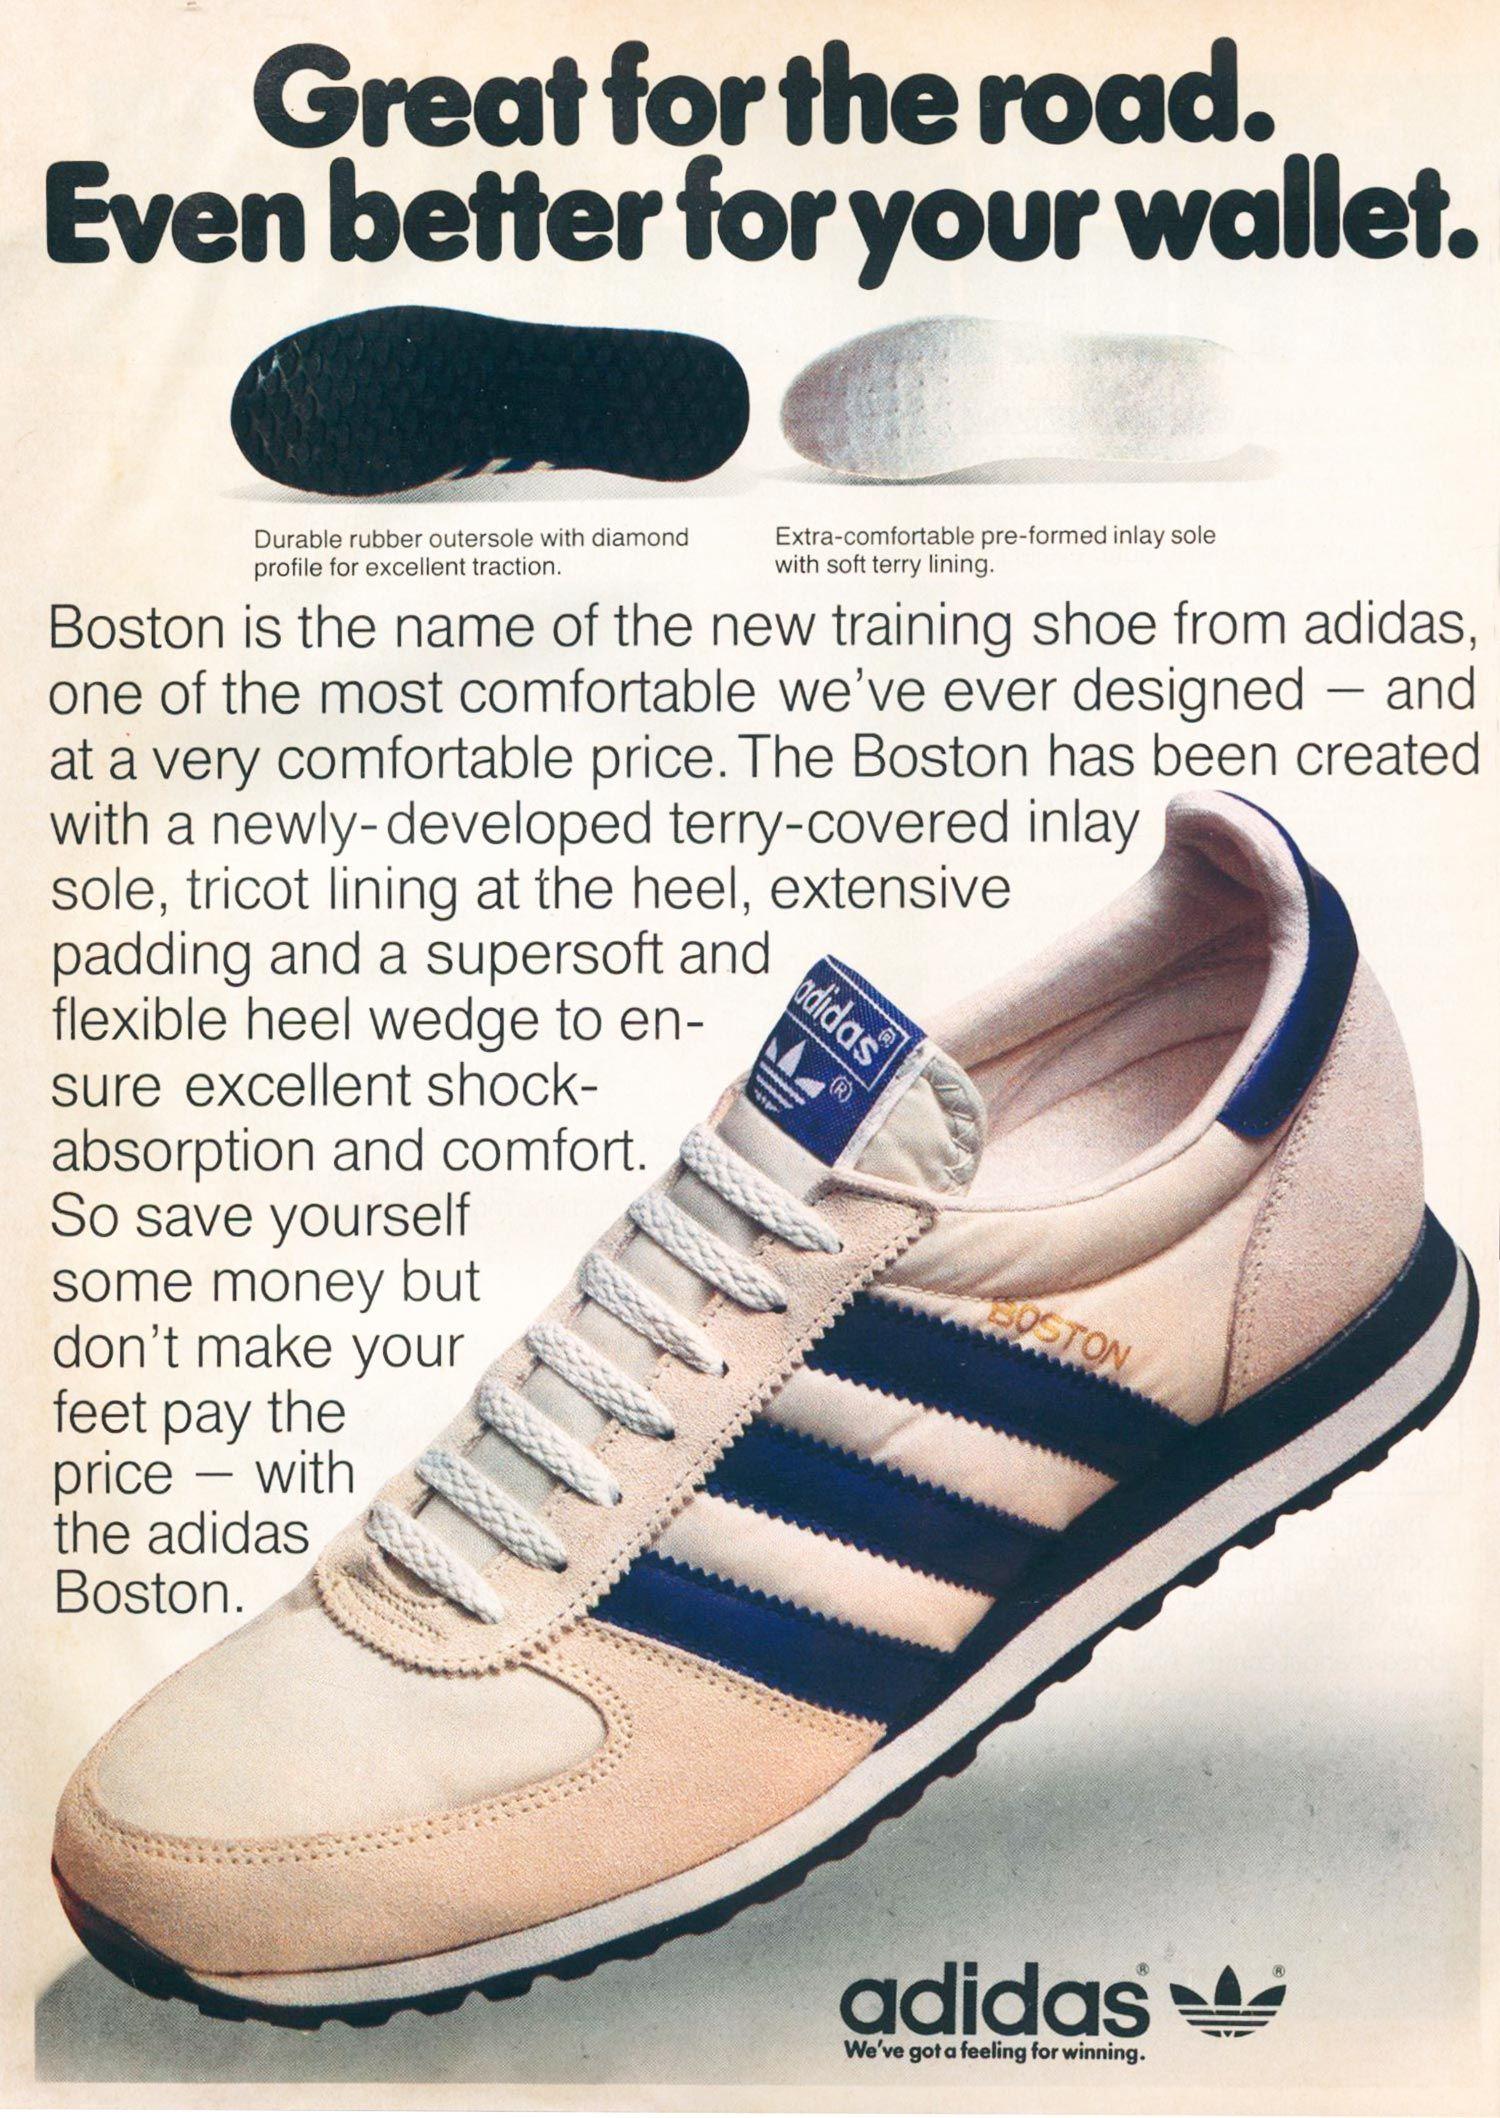 Adidas Boston 1981 vintage sneaker ad